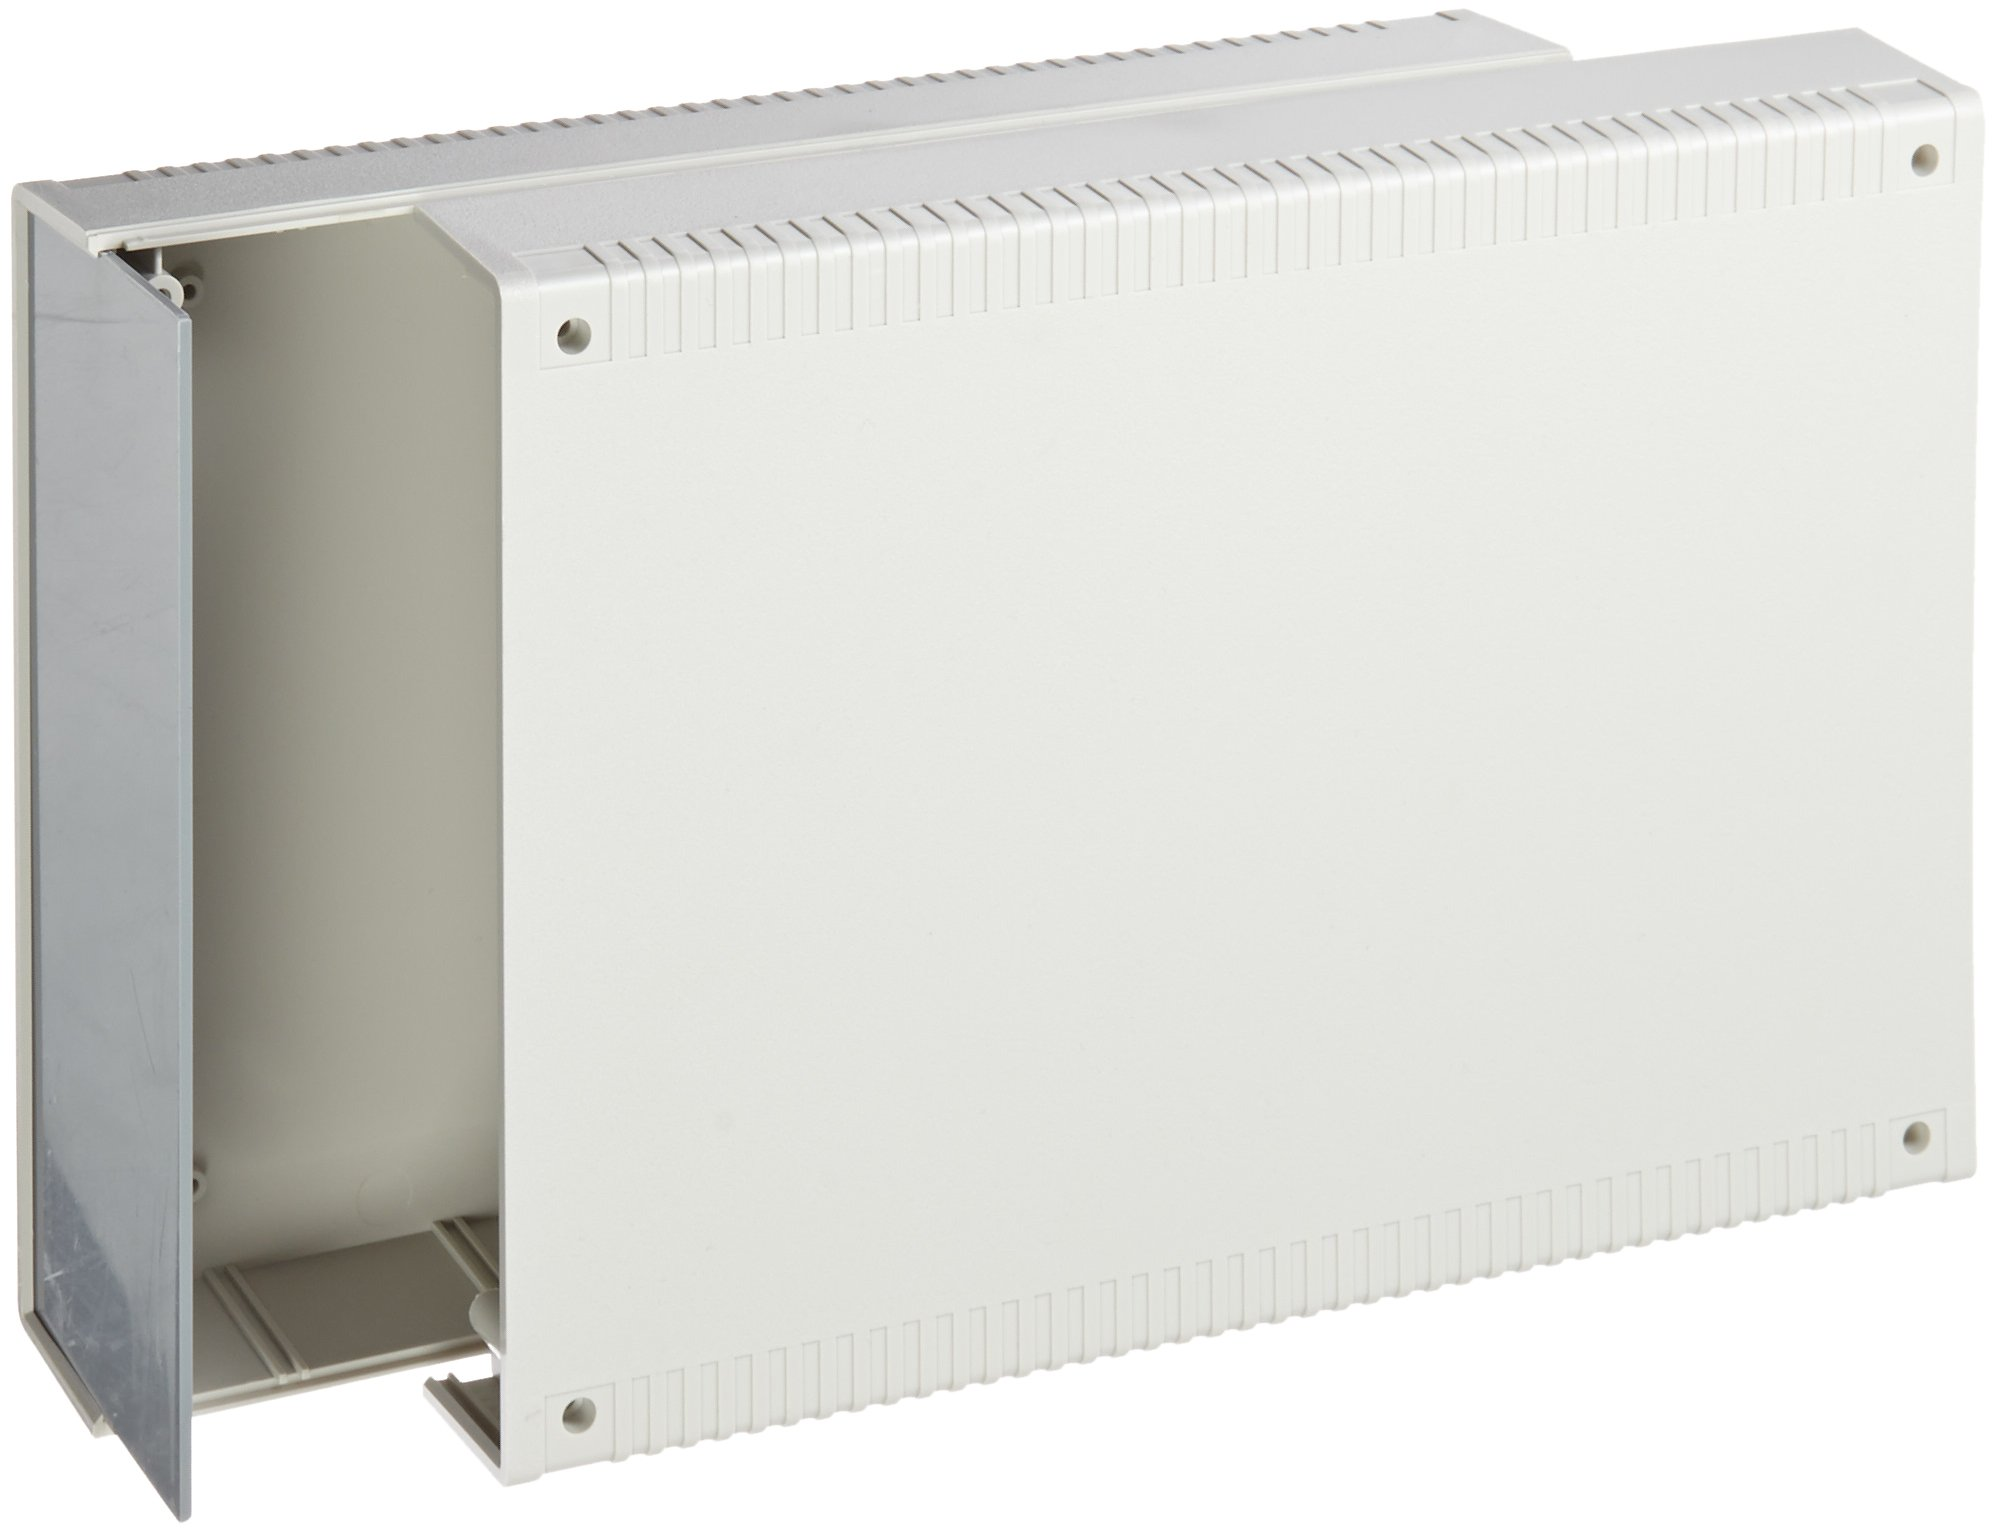 BUD Industries PC-11471 Plastic Style E Box, 7-55/64'' Width x 3-9/64'' Height x 11-1/64'' Depth, Gray Finish